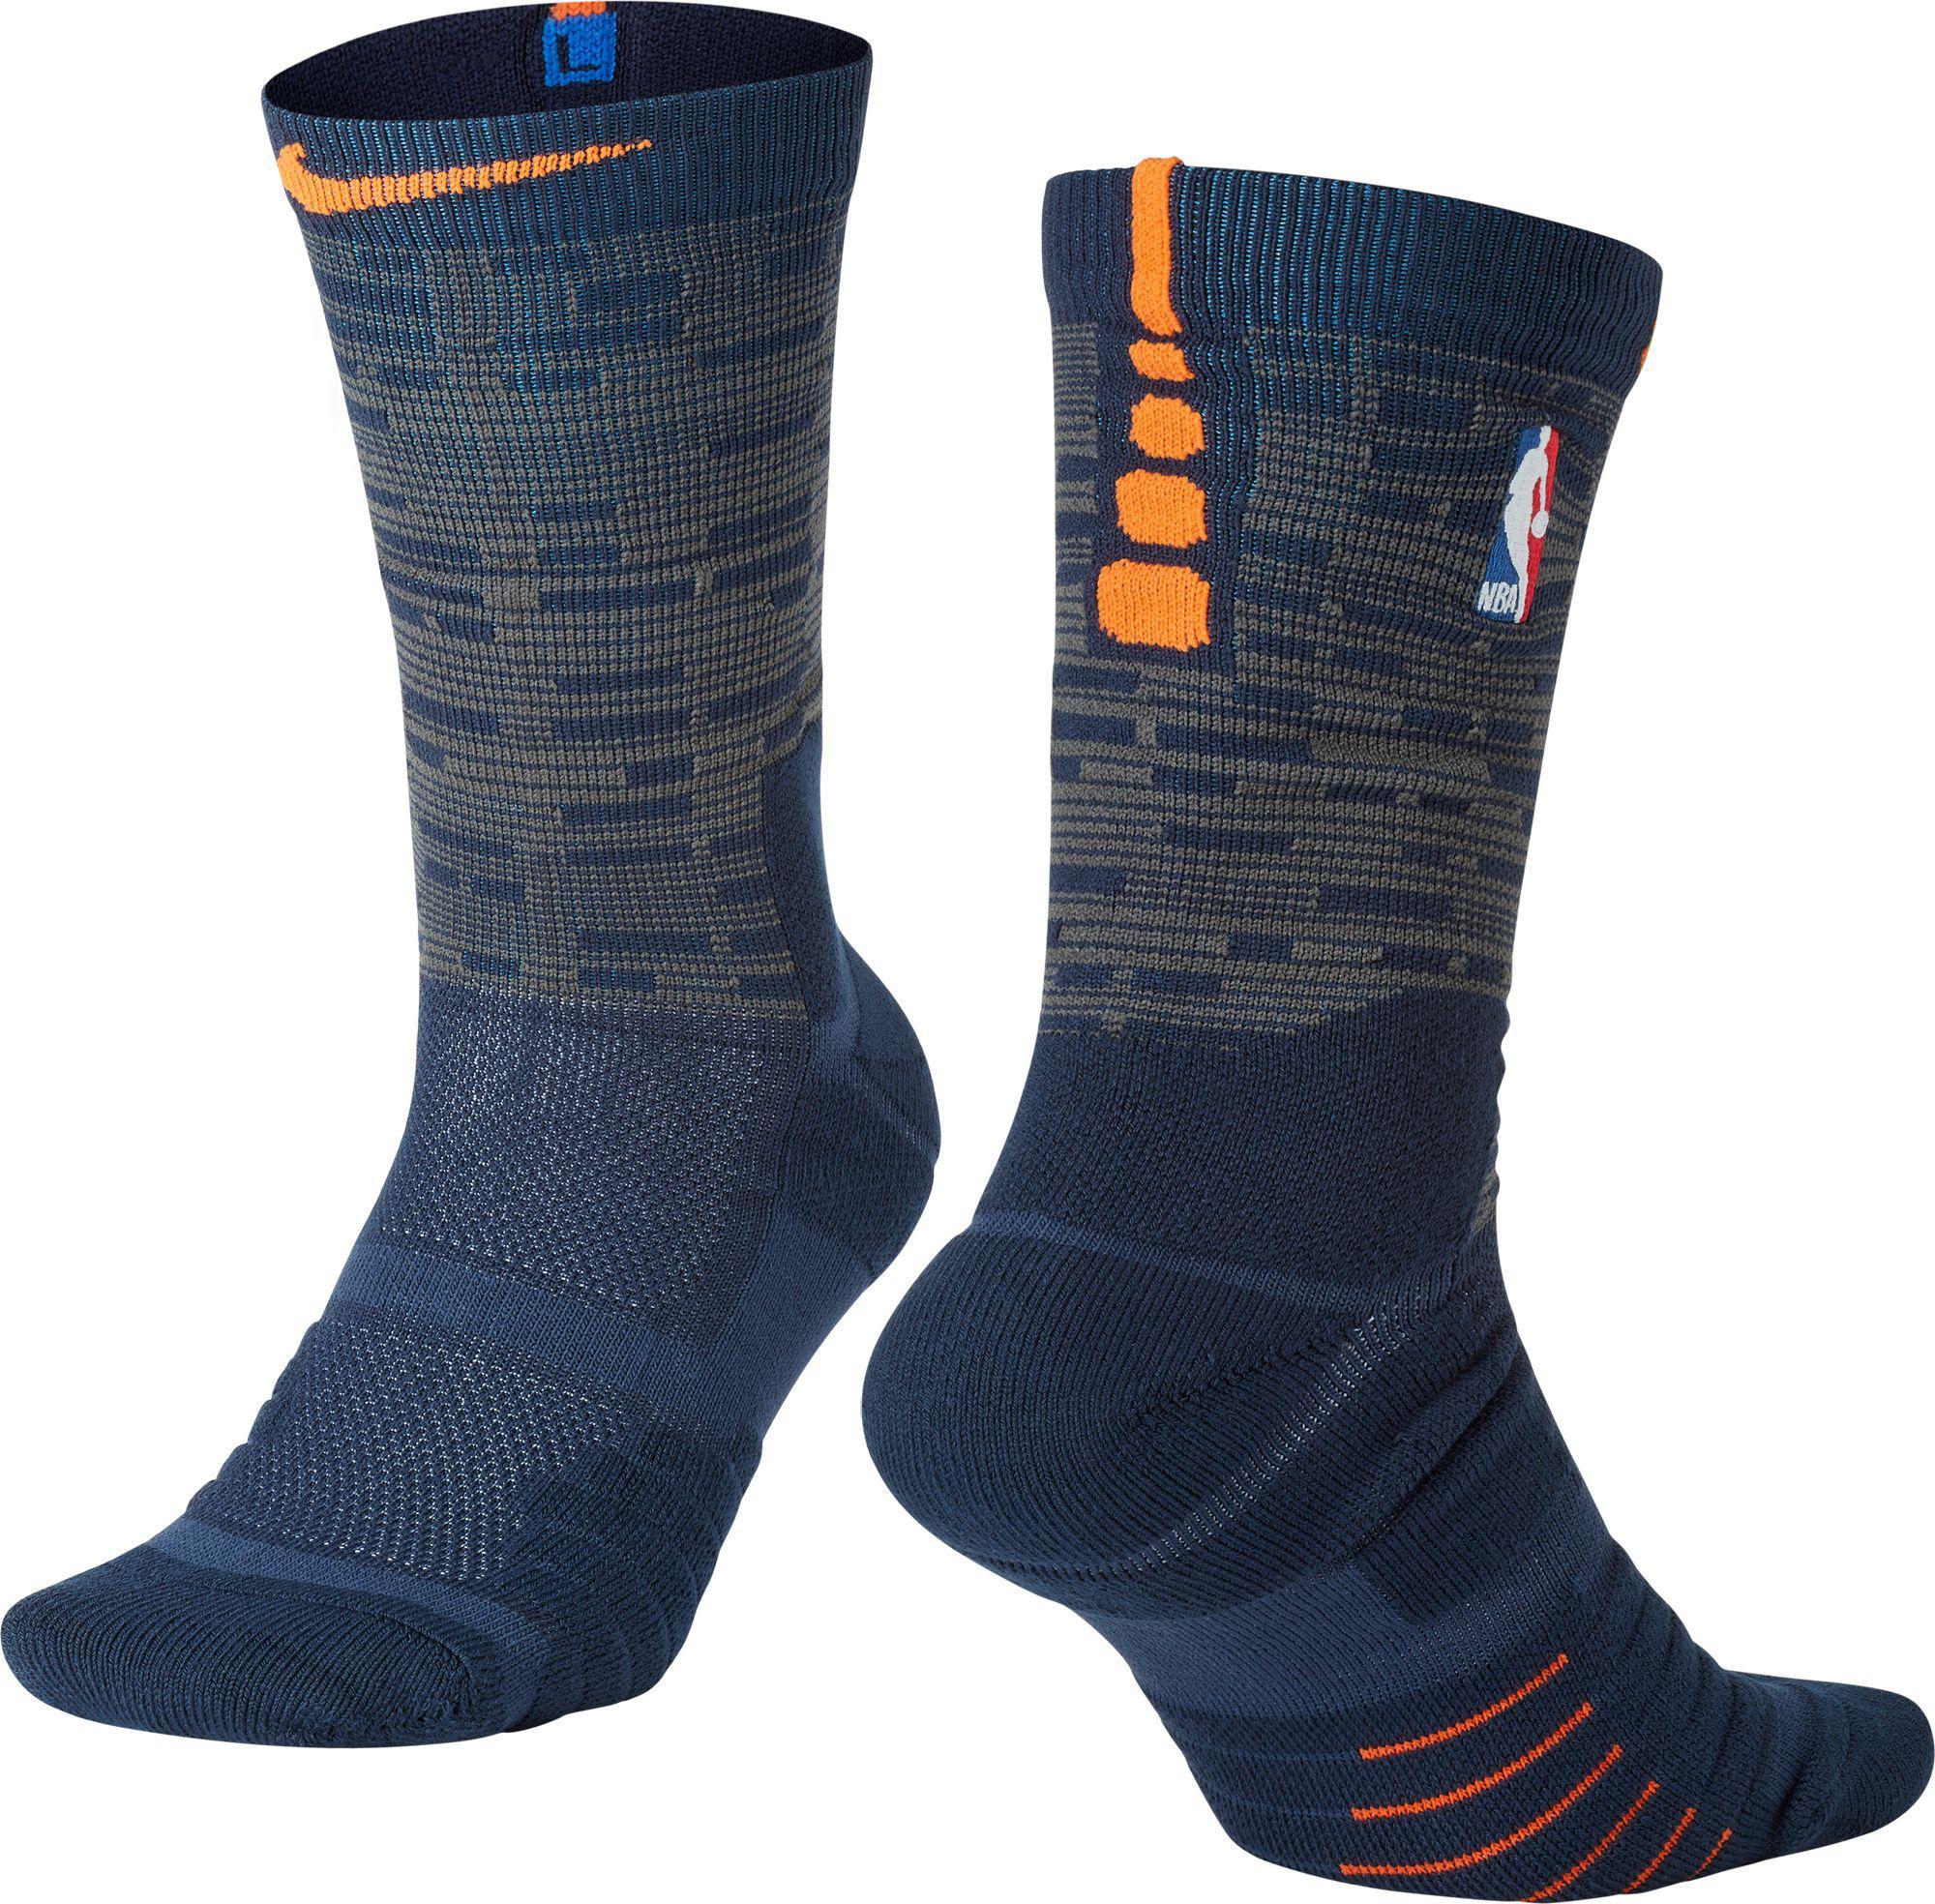 0a5ab0e1ea6 Nike New York Knicks City Edition Elite Quick Nba Crew Socks in Blue ...